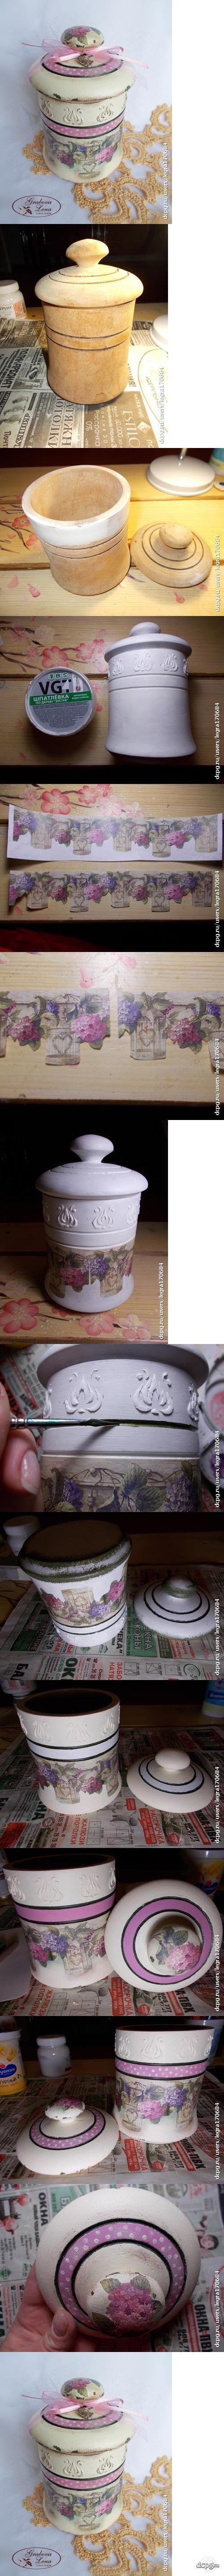 "Декупаж - Сайт любителей декупажа - DCPG.RU | Баночка ""Гортензия"" Click on photo to see more! Нажмите на фото чтобы увидеть больше! decoupage art craft handmade home decor DIY do it yourself tutorial"